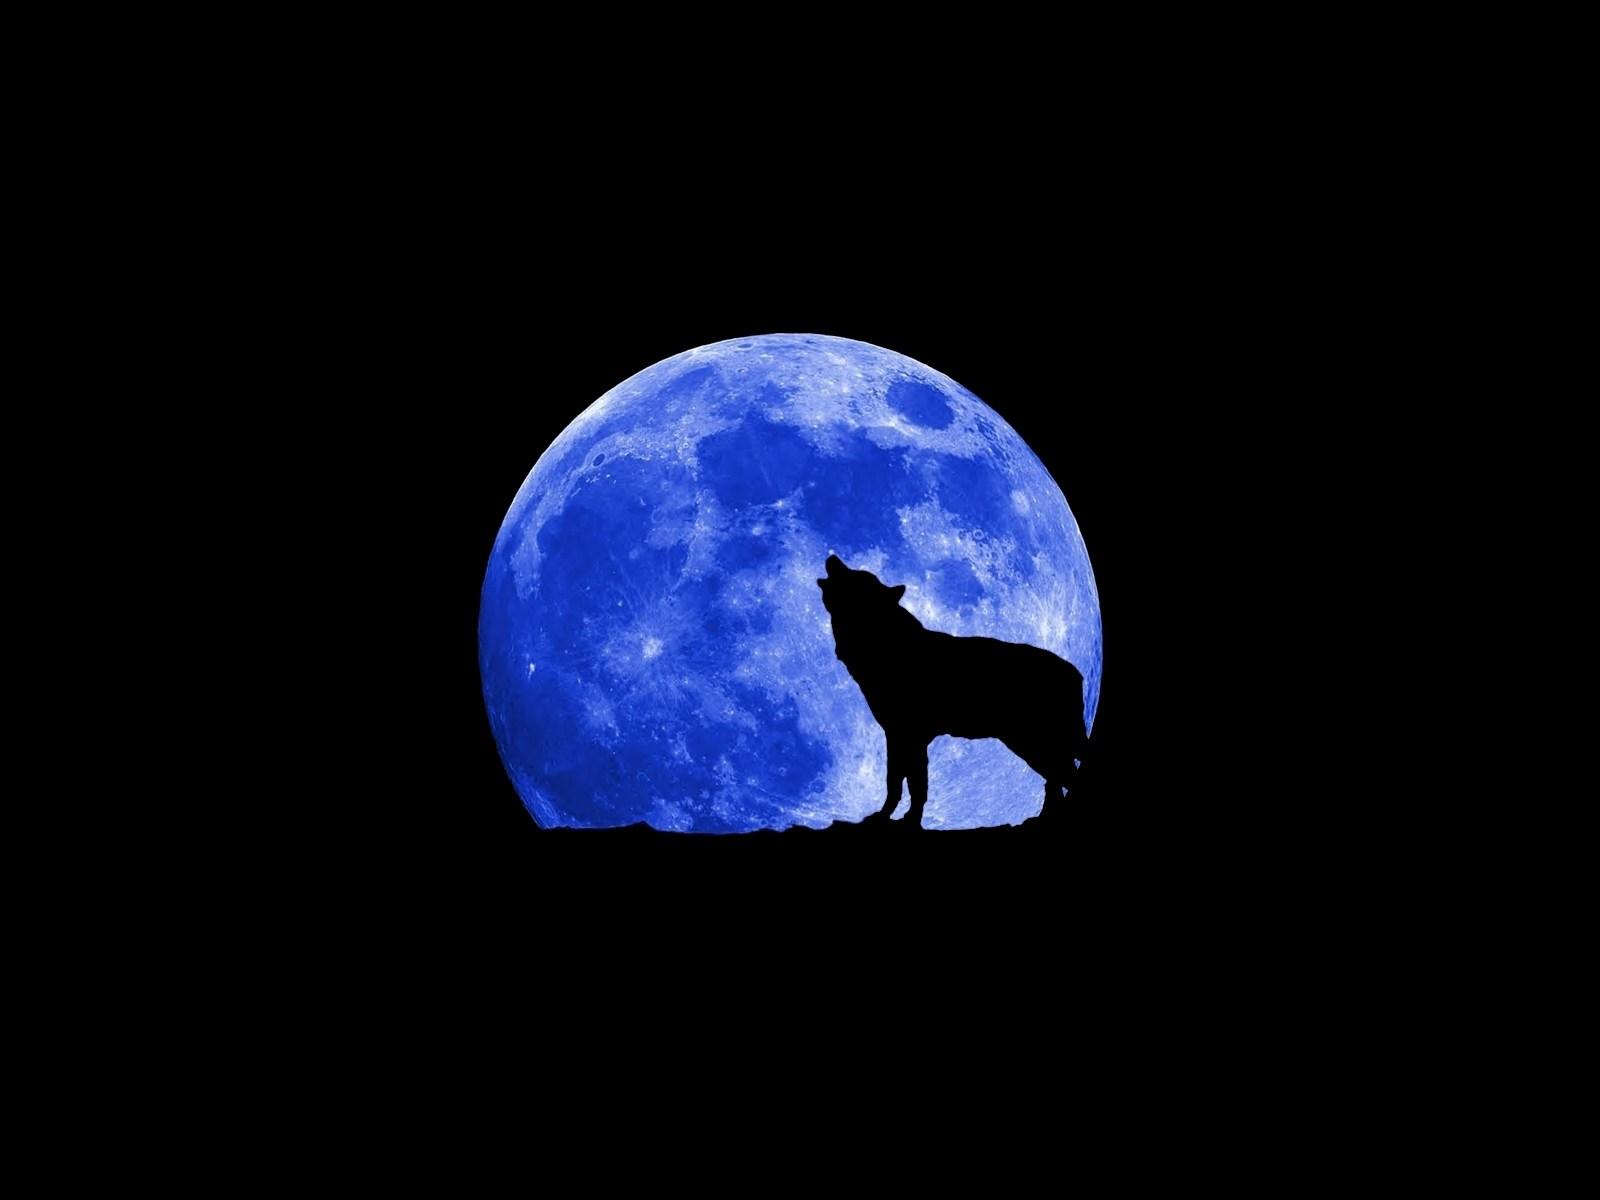 Я хочу... - Страница 15 Wolf-blue-moon.74266